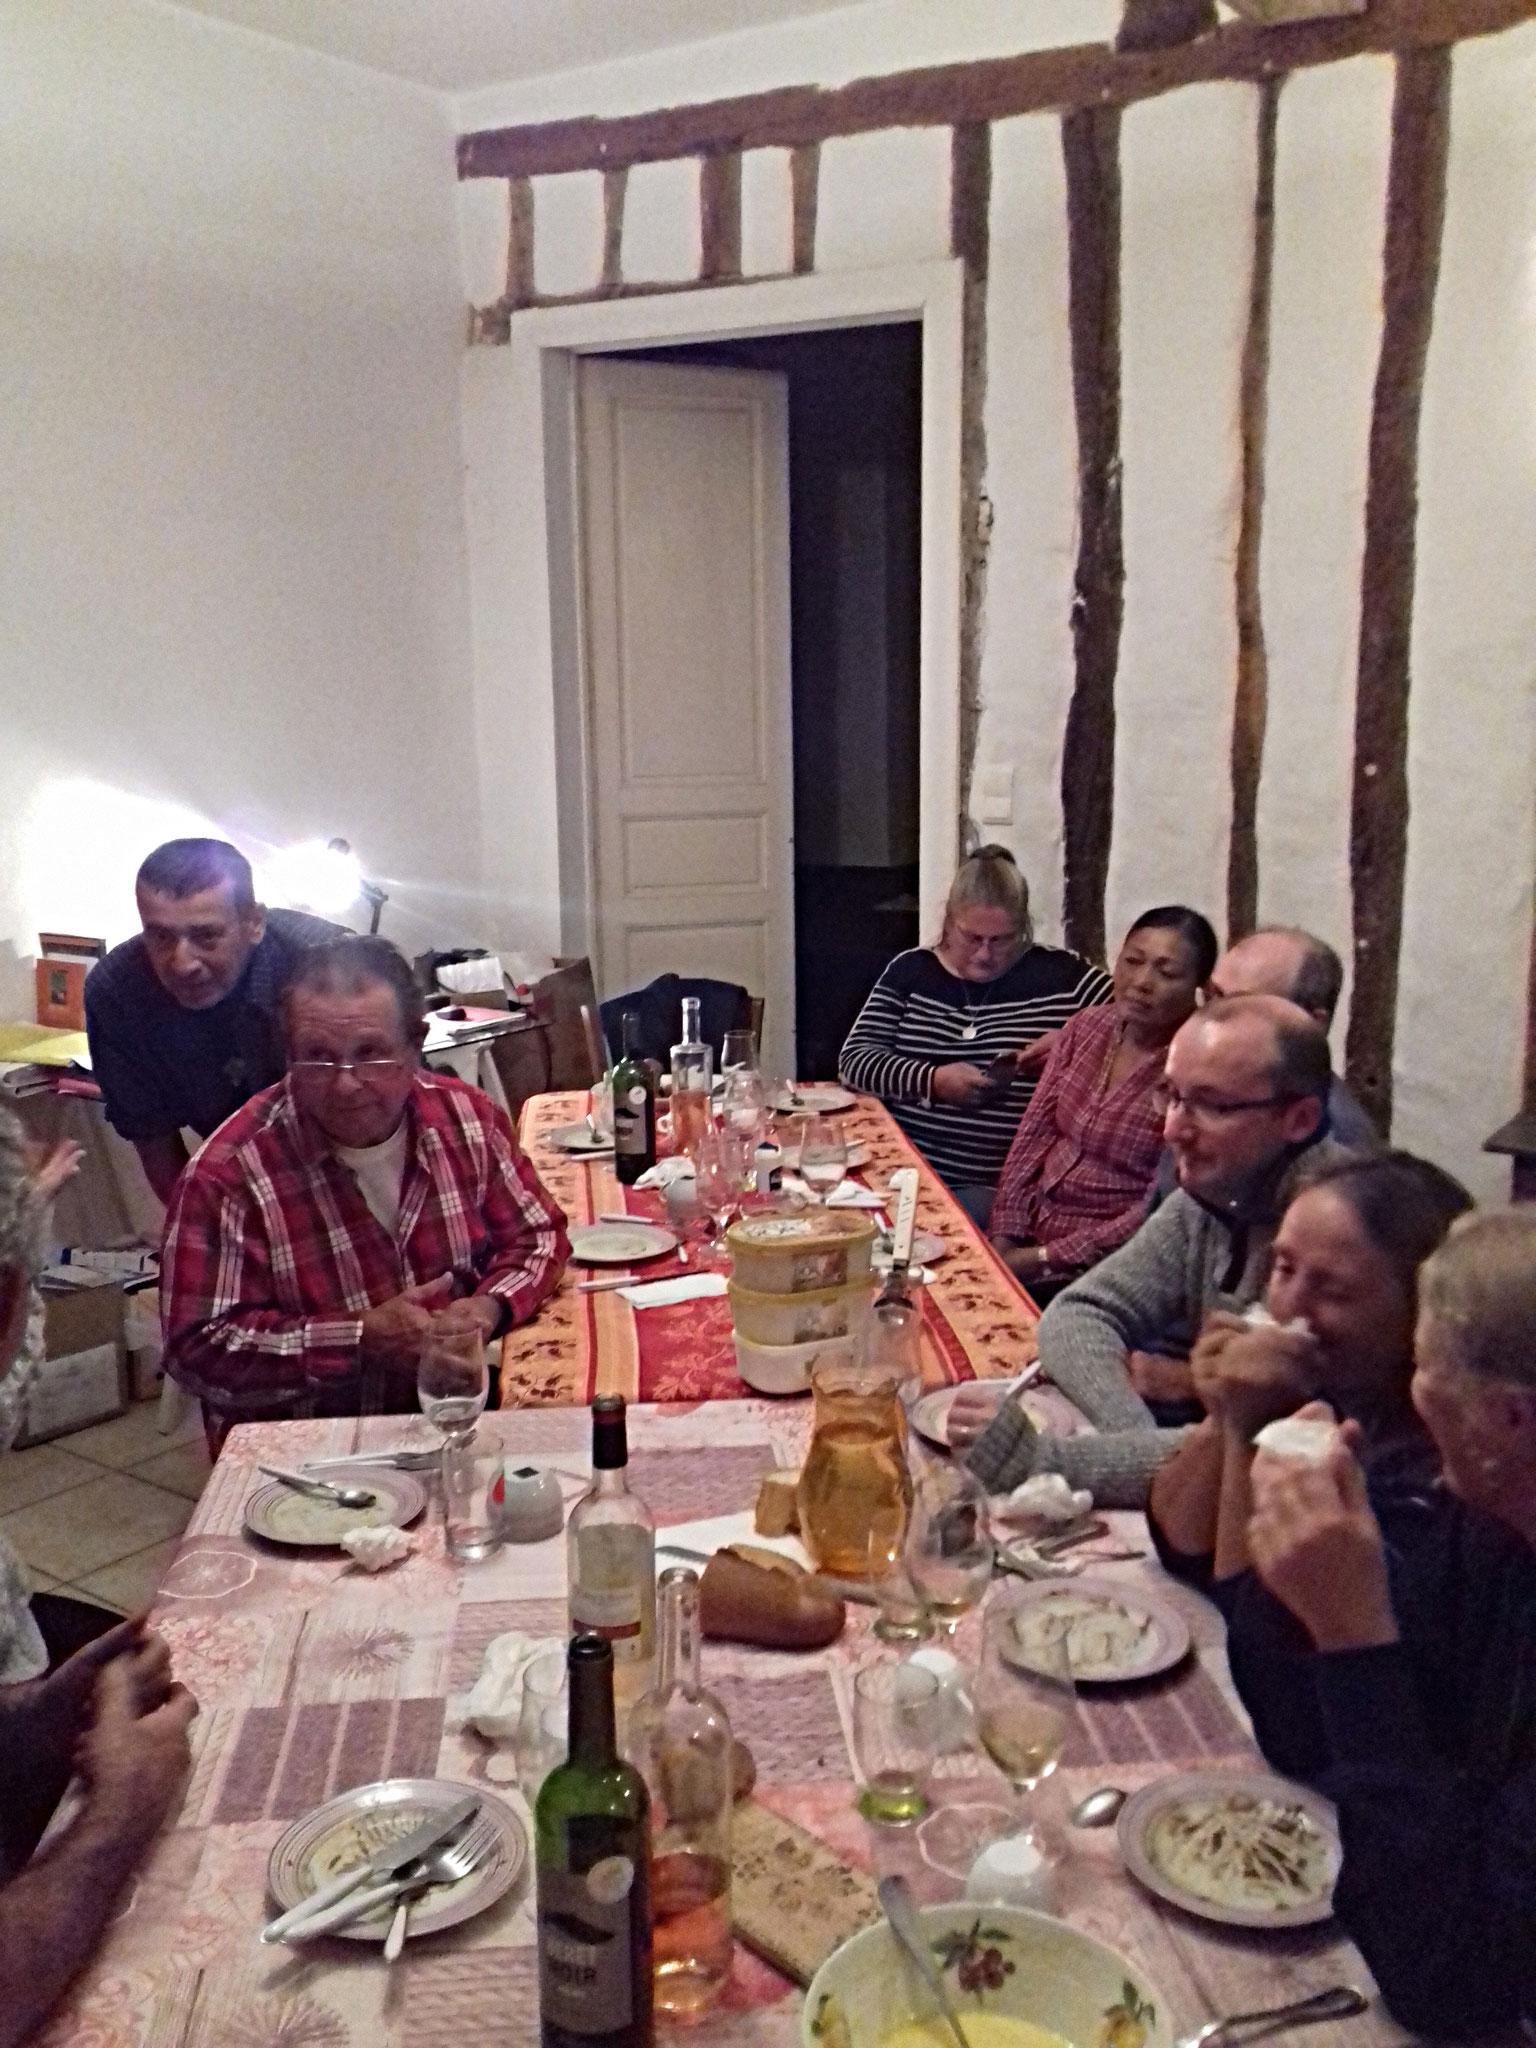 Marisol,pascual, Manfred, Denis, les 2 Philippe, Martine Gaelle, Florence, Véronique,Sébastien, Brice, Joel